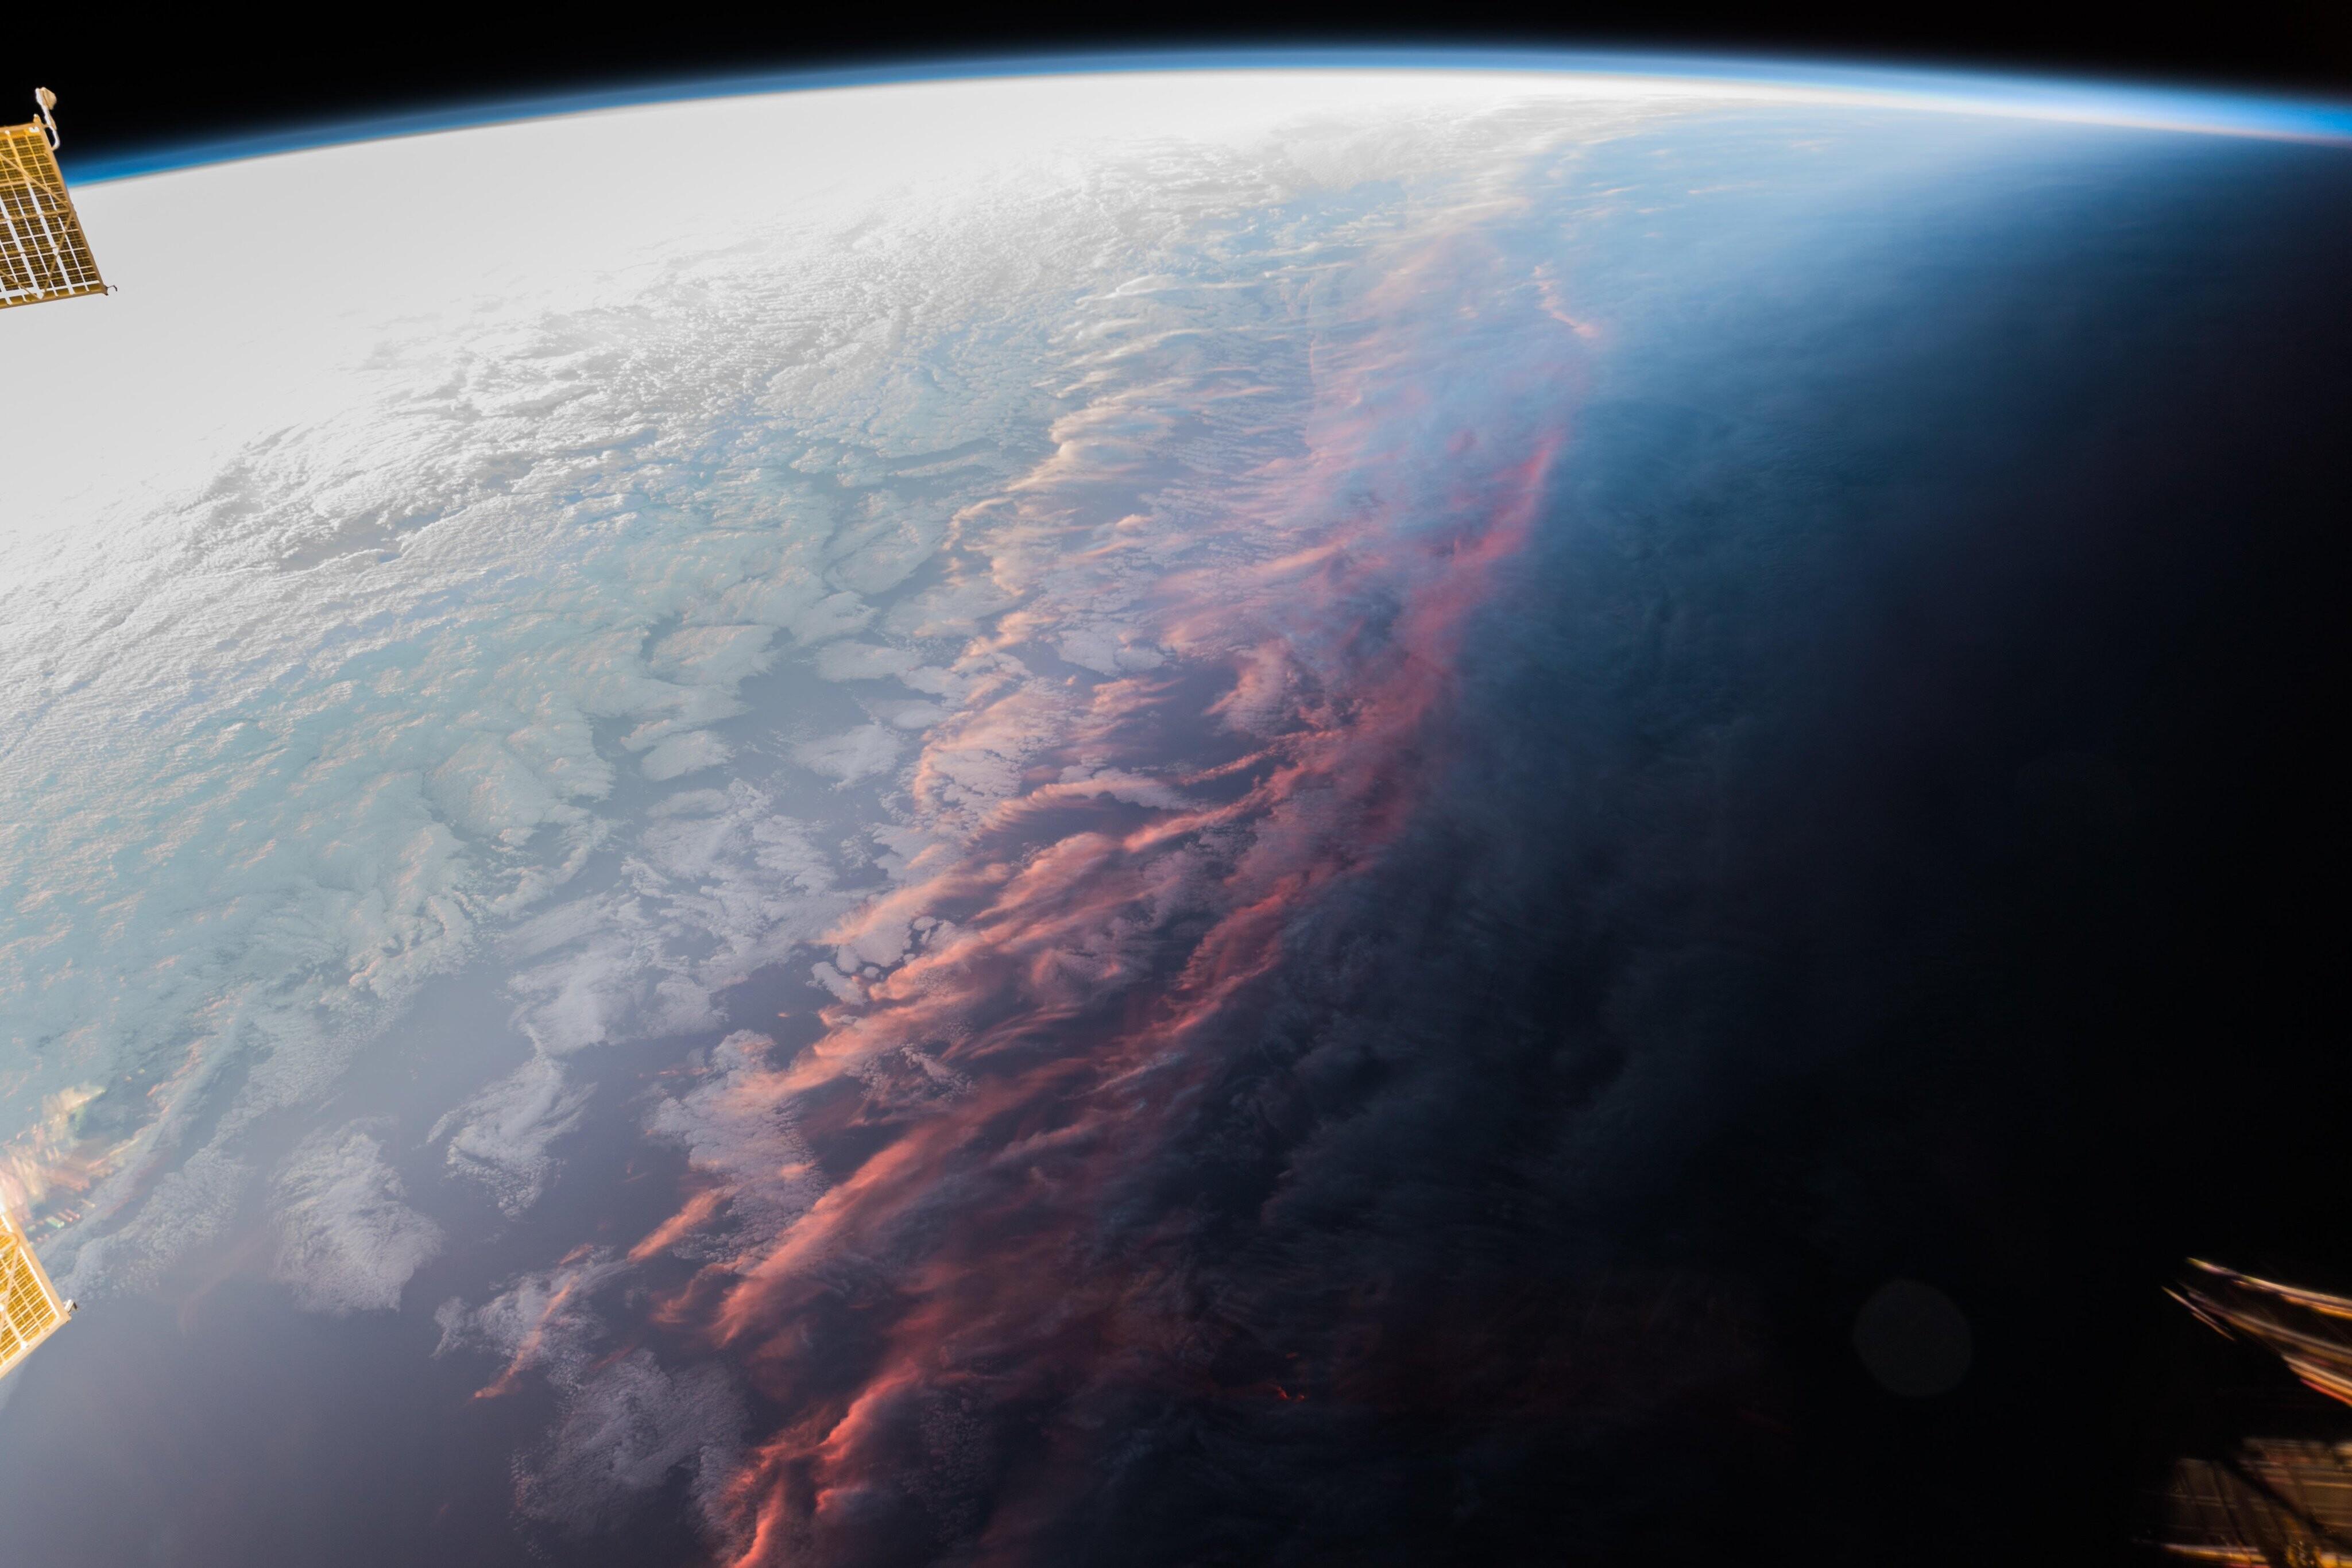 Закат на Земле, вид из космоса. Автор Александр Герст